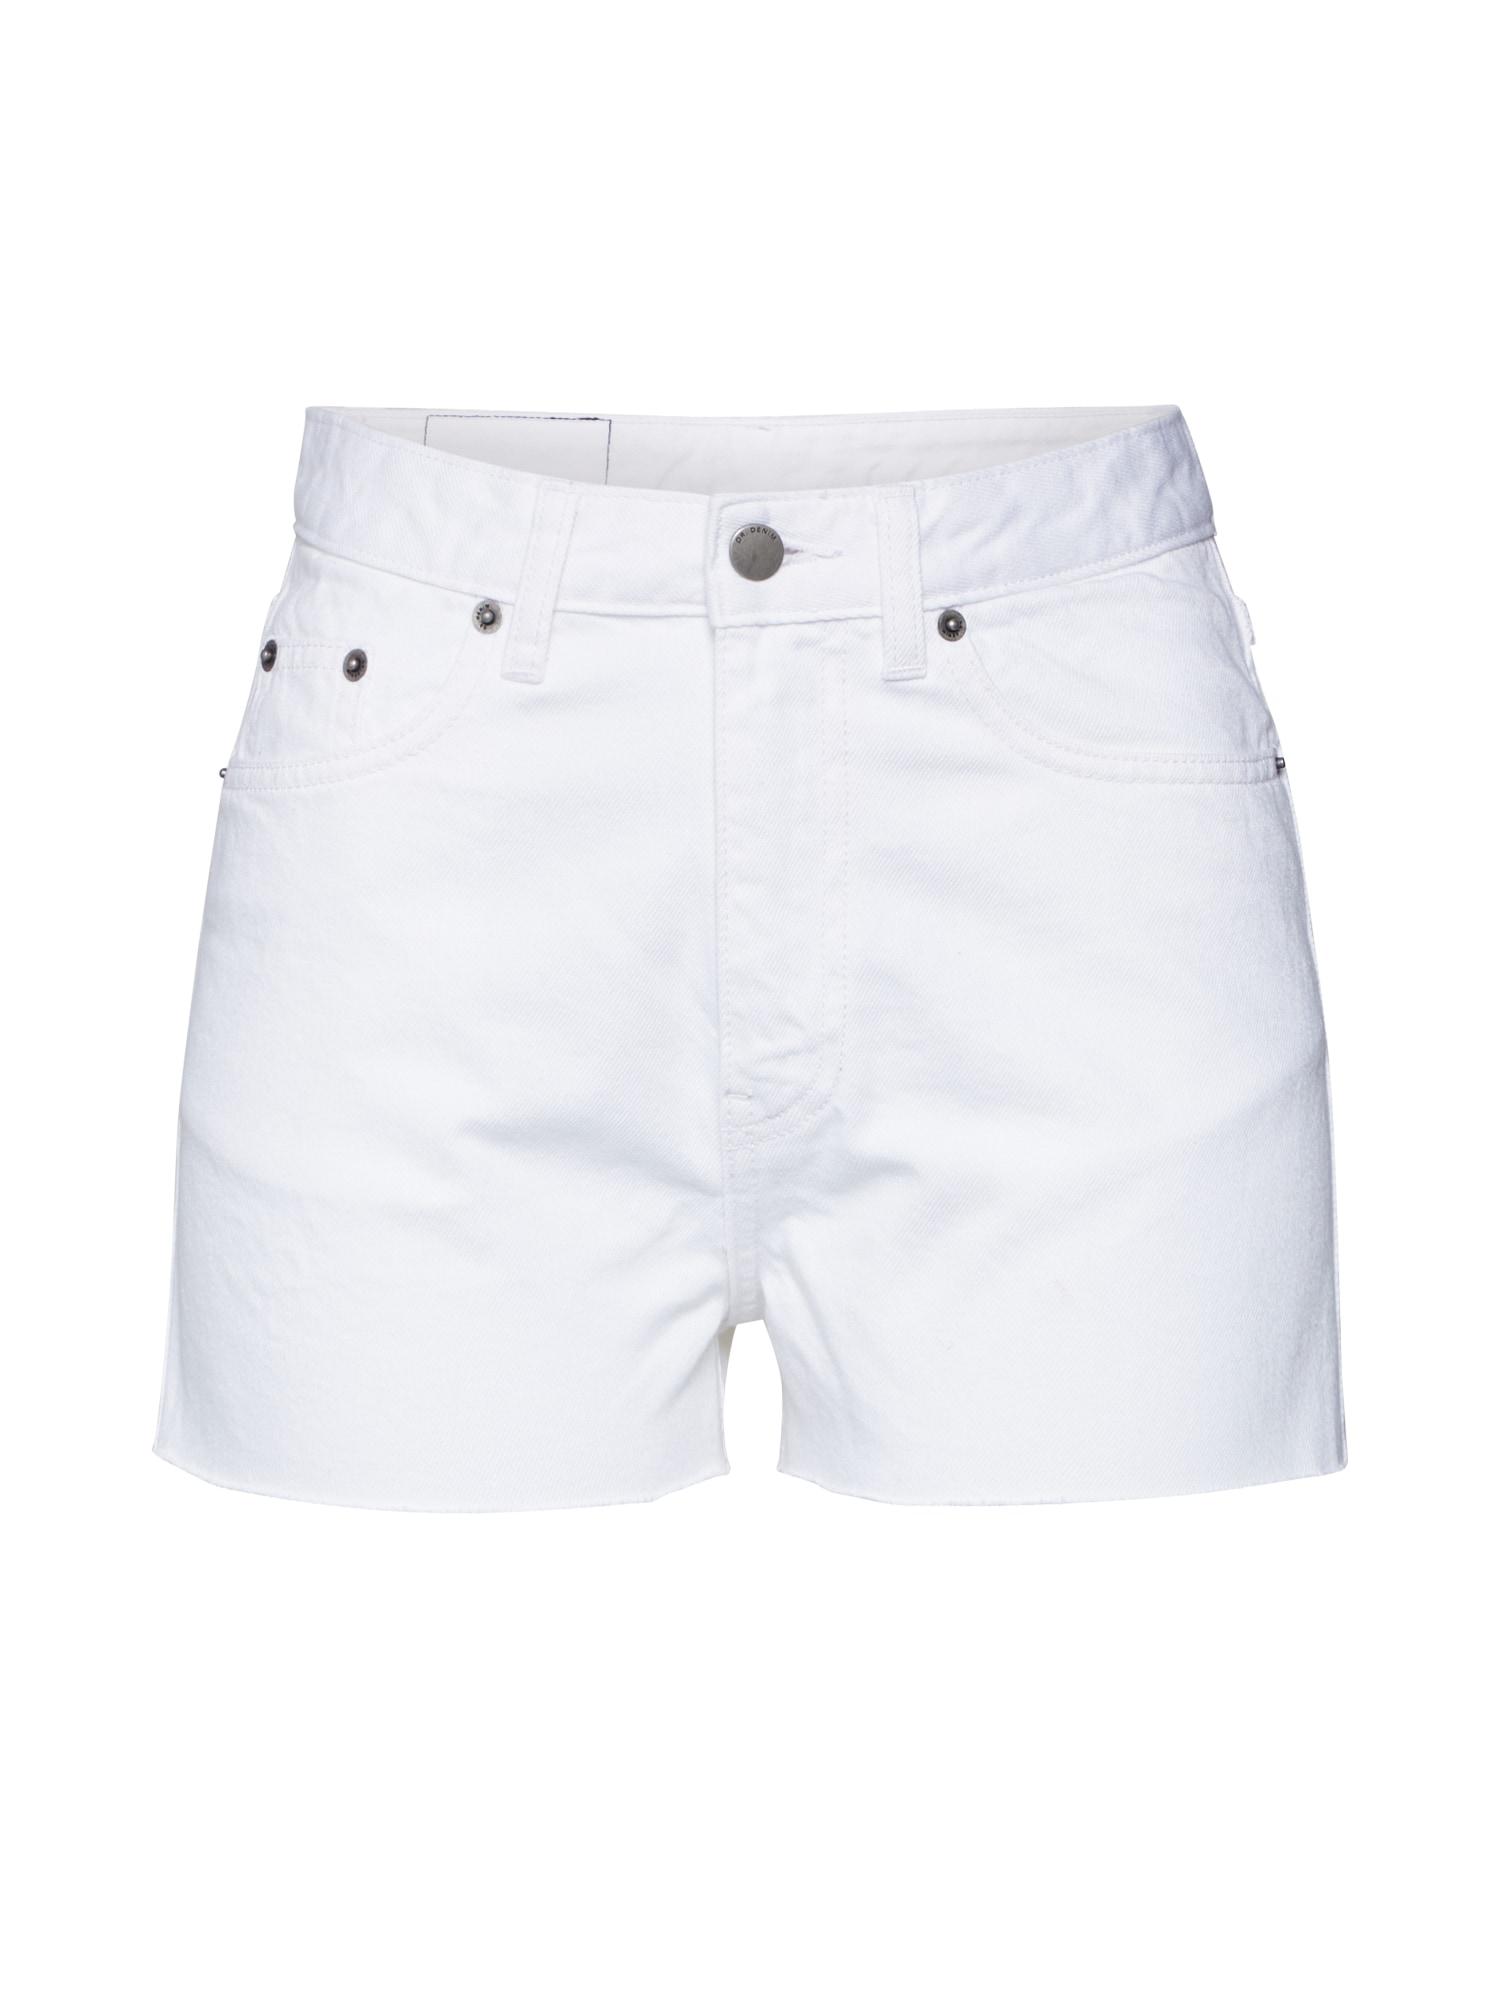 Dr. Denim Džinsai 'Skye' balto džinso spalva